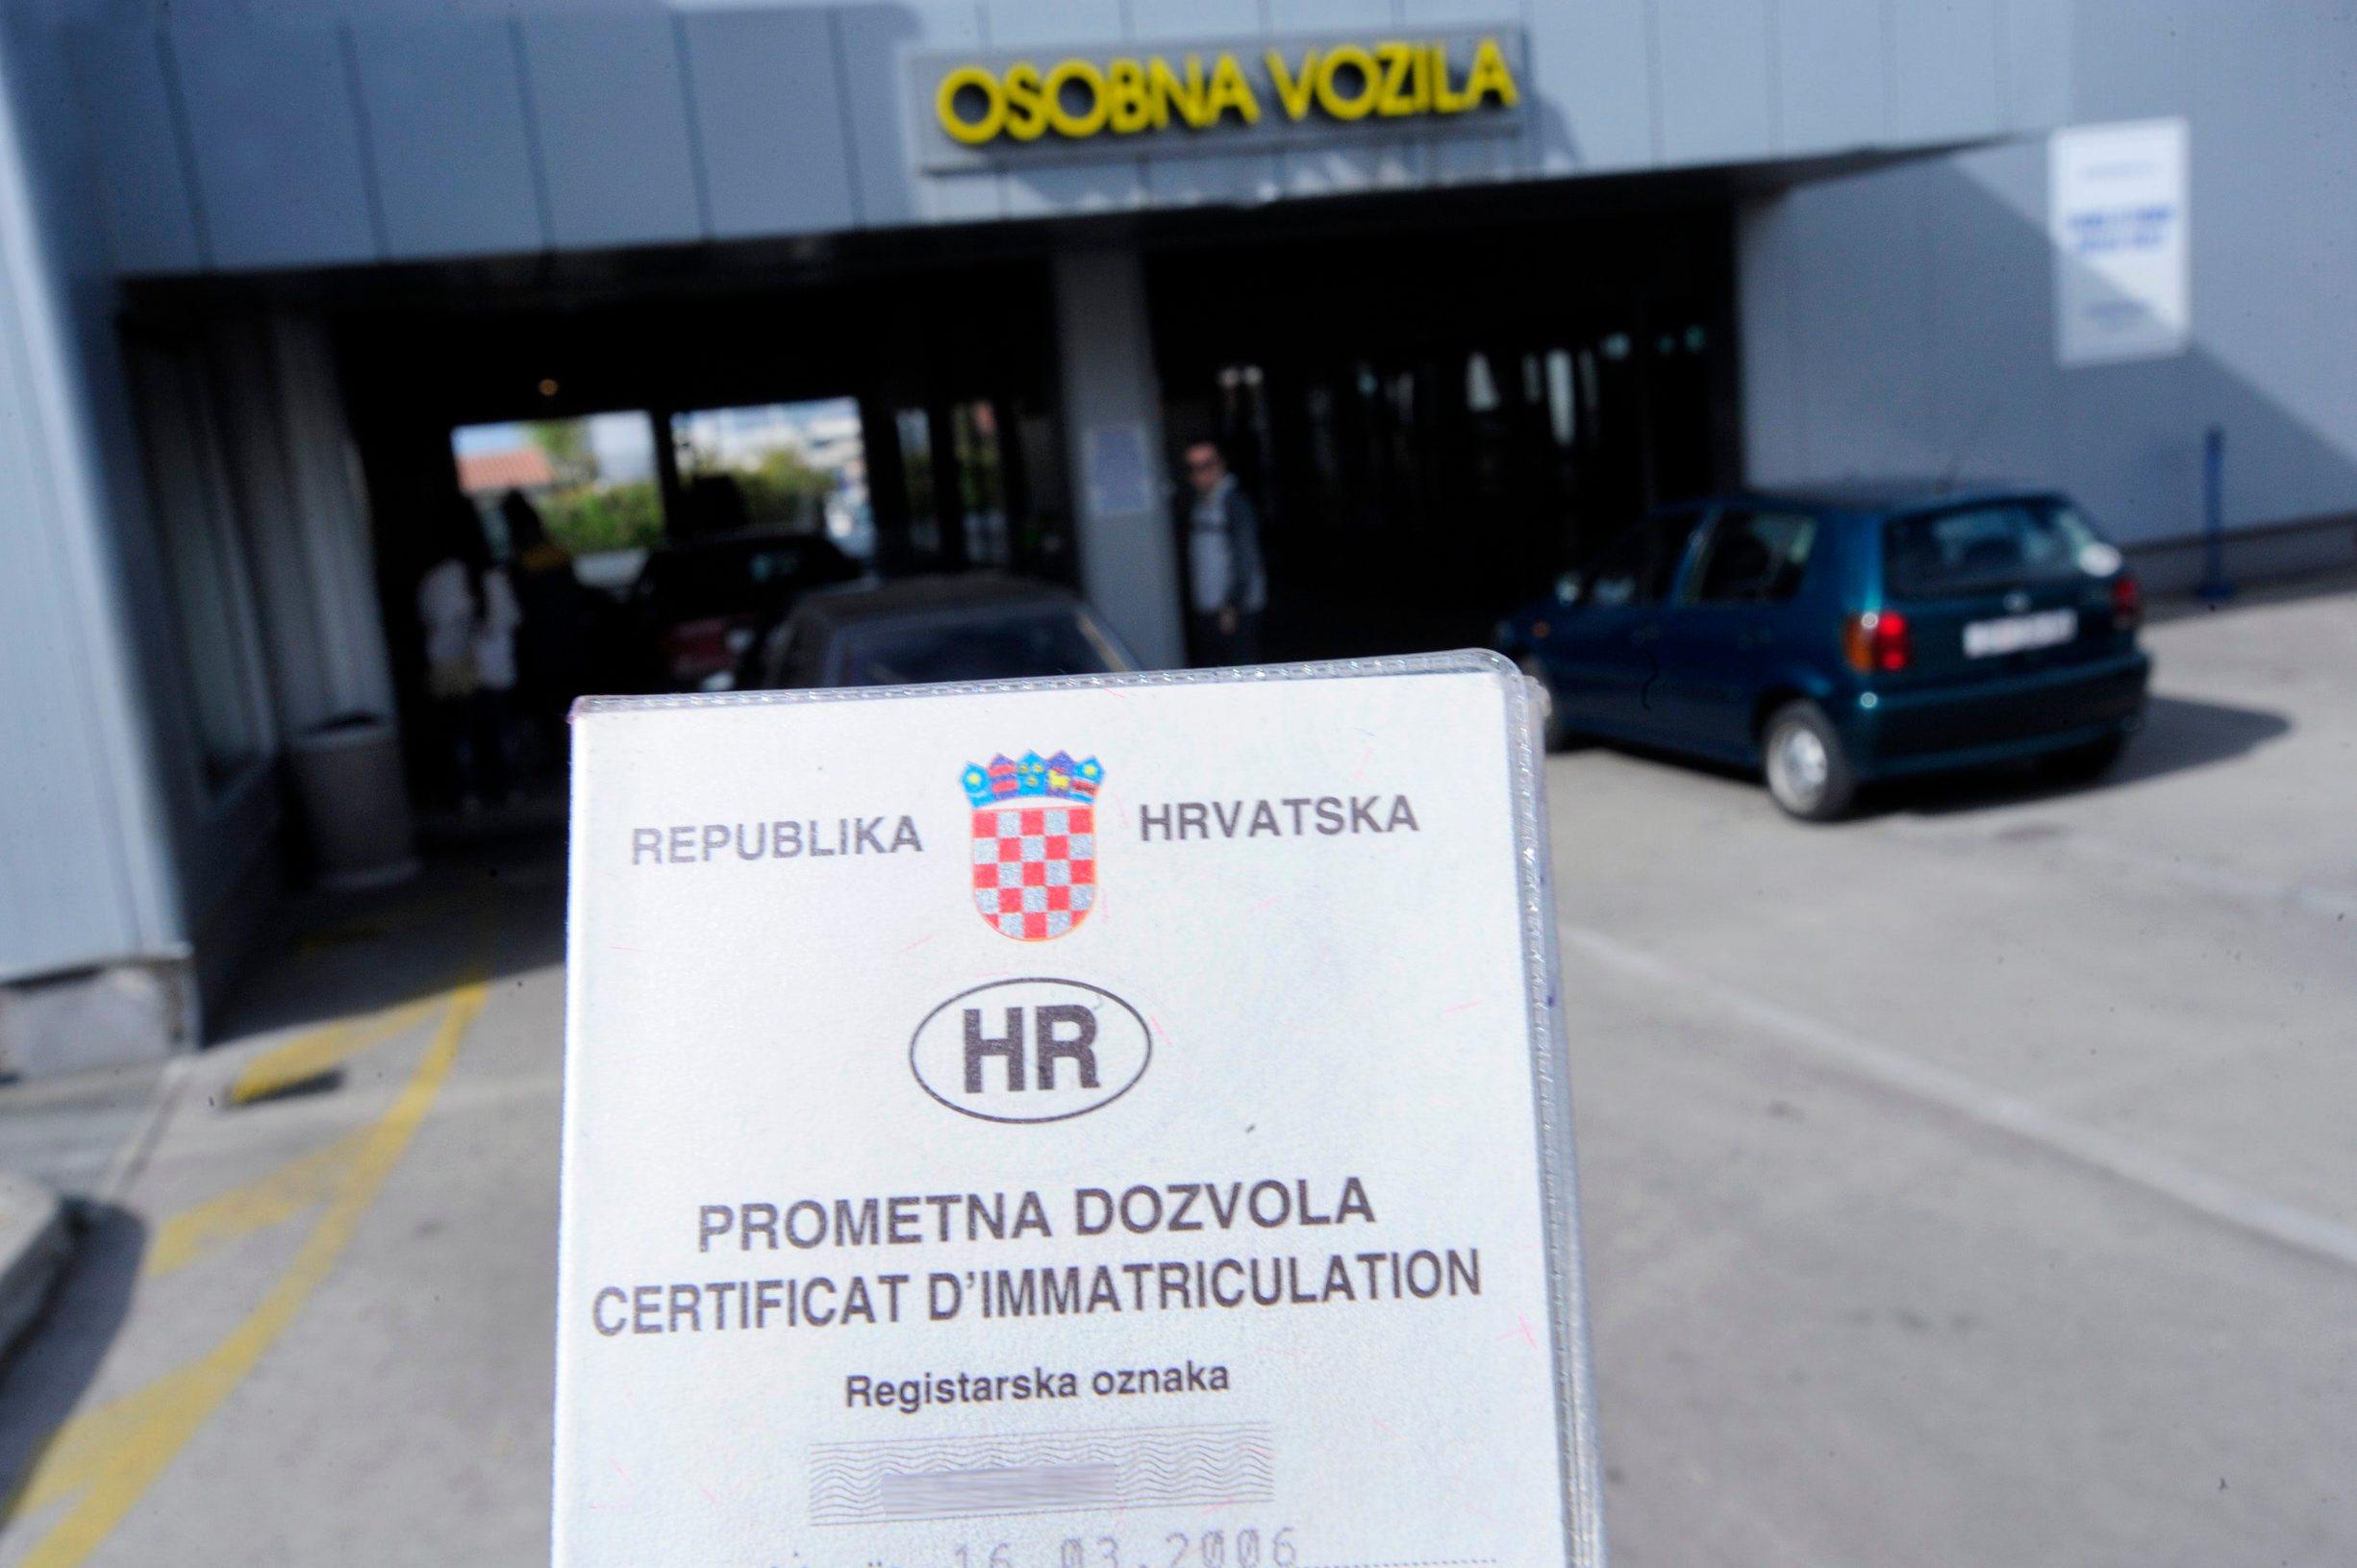 prometna_dozvola2-201010